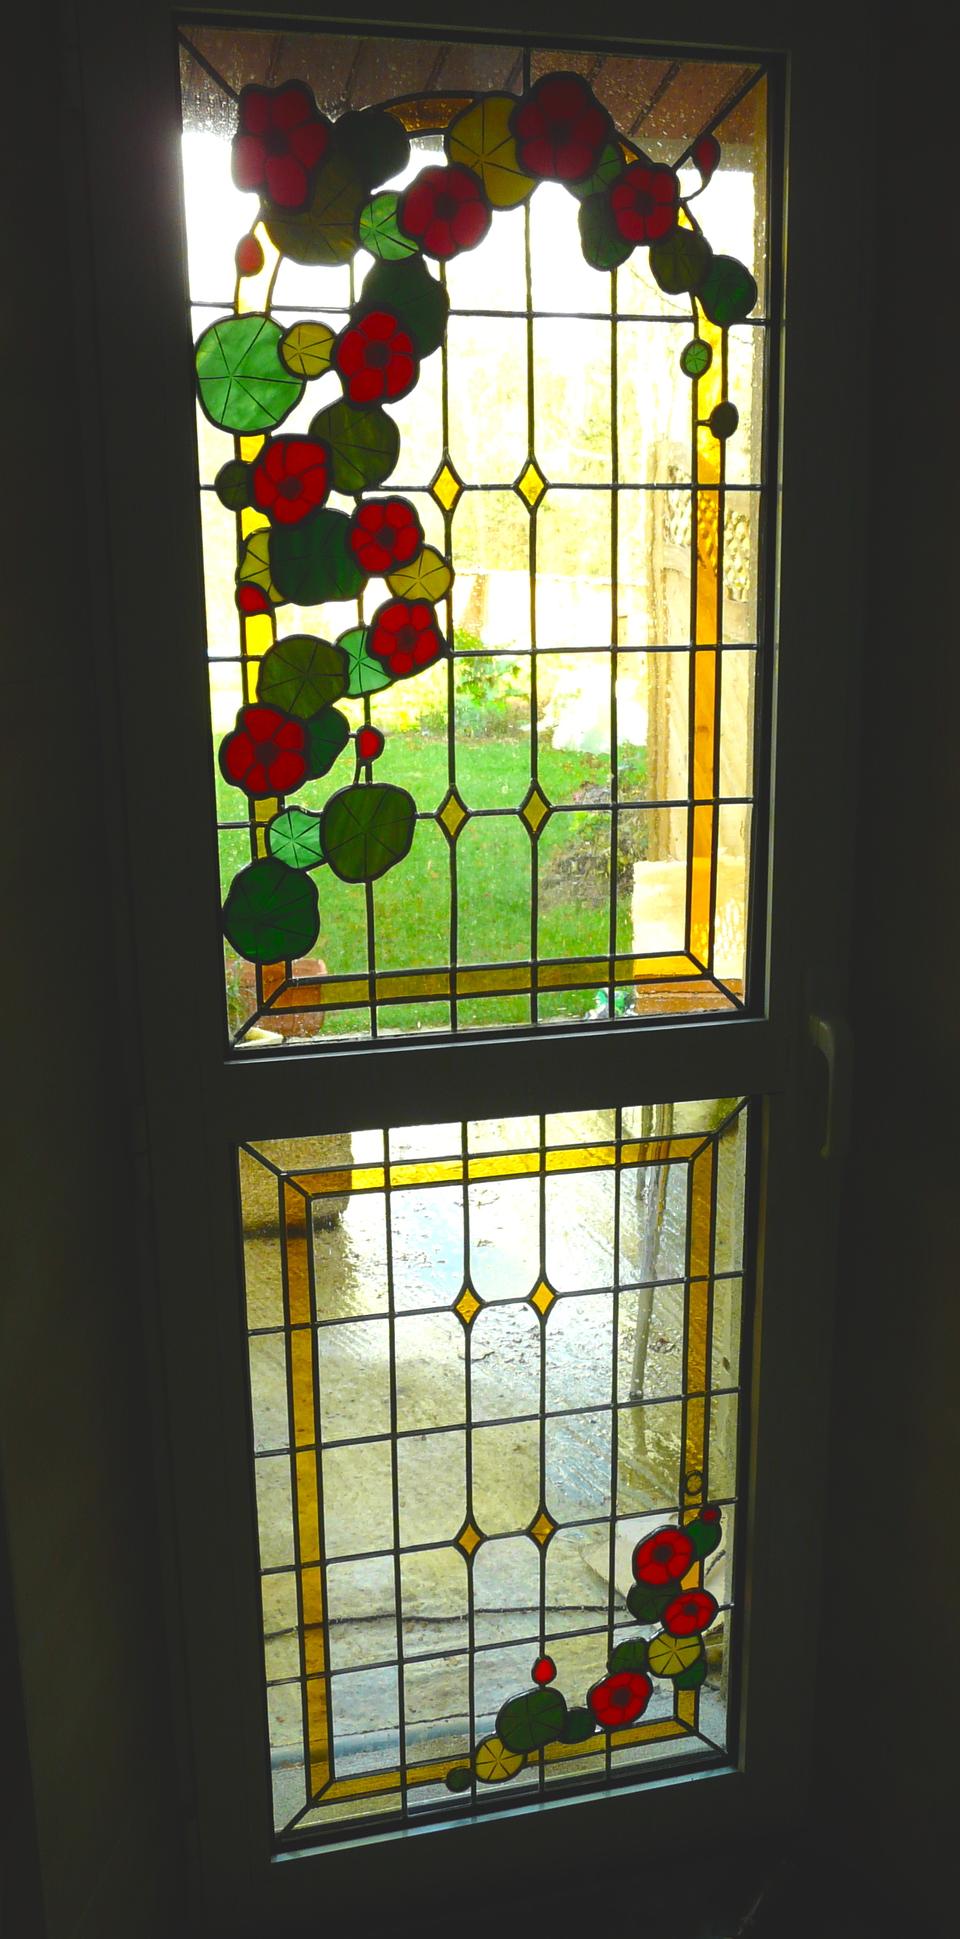 d coration int rieure cr ation restauration simple pur transparence vitrail classique motif. Black Bedroom Furniture Sets. Home Design Ideas